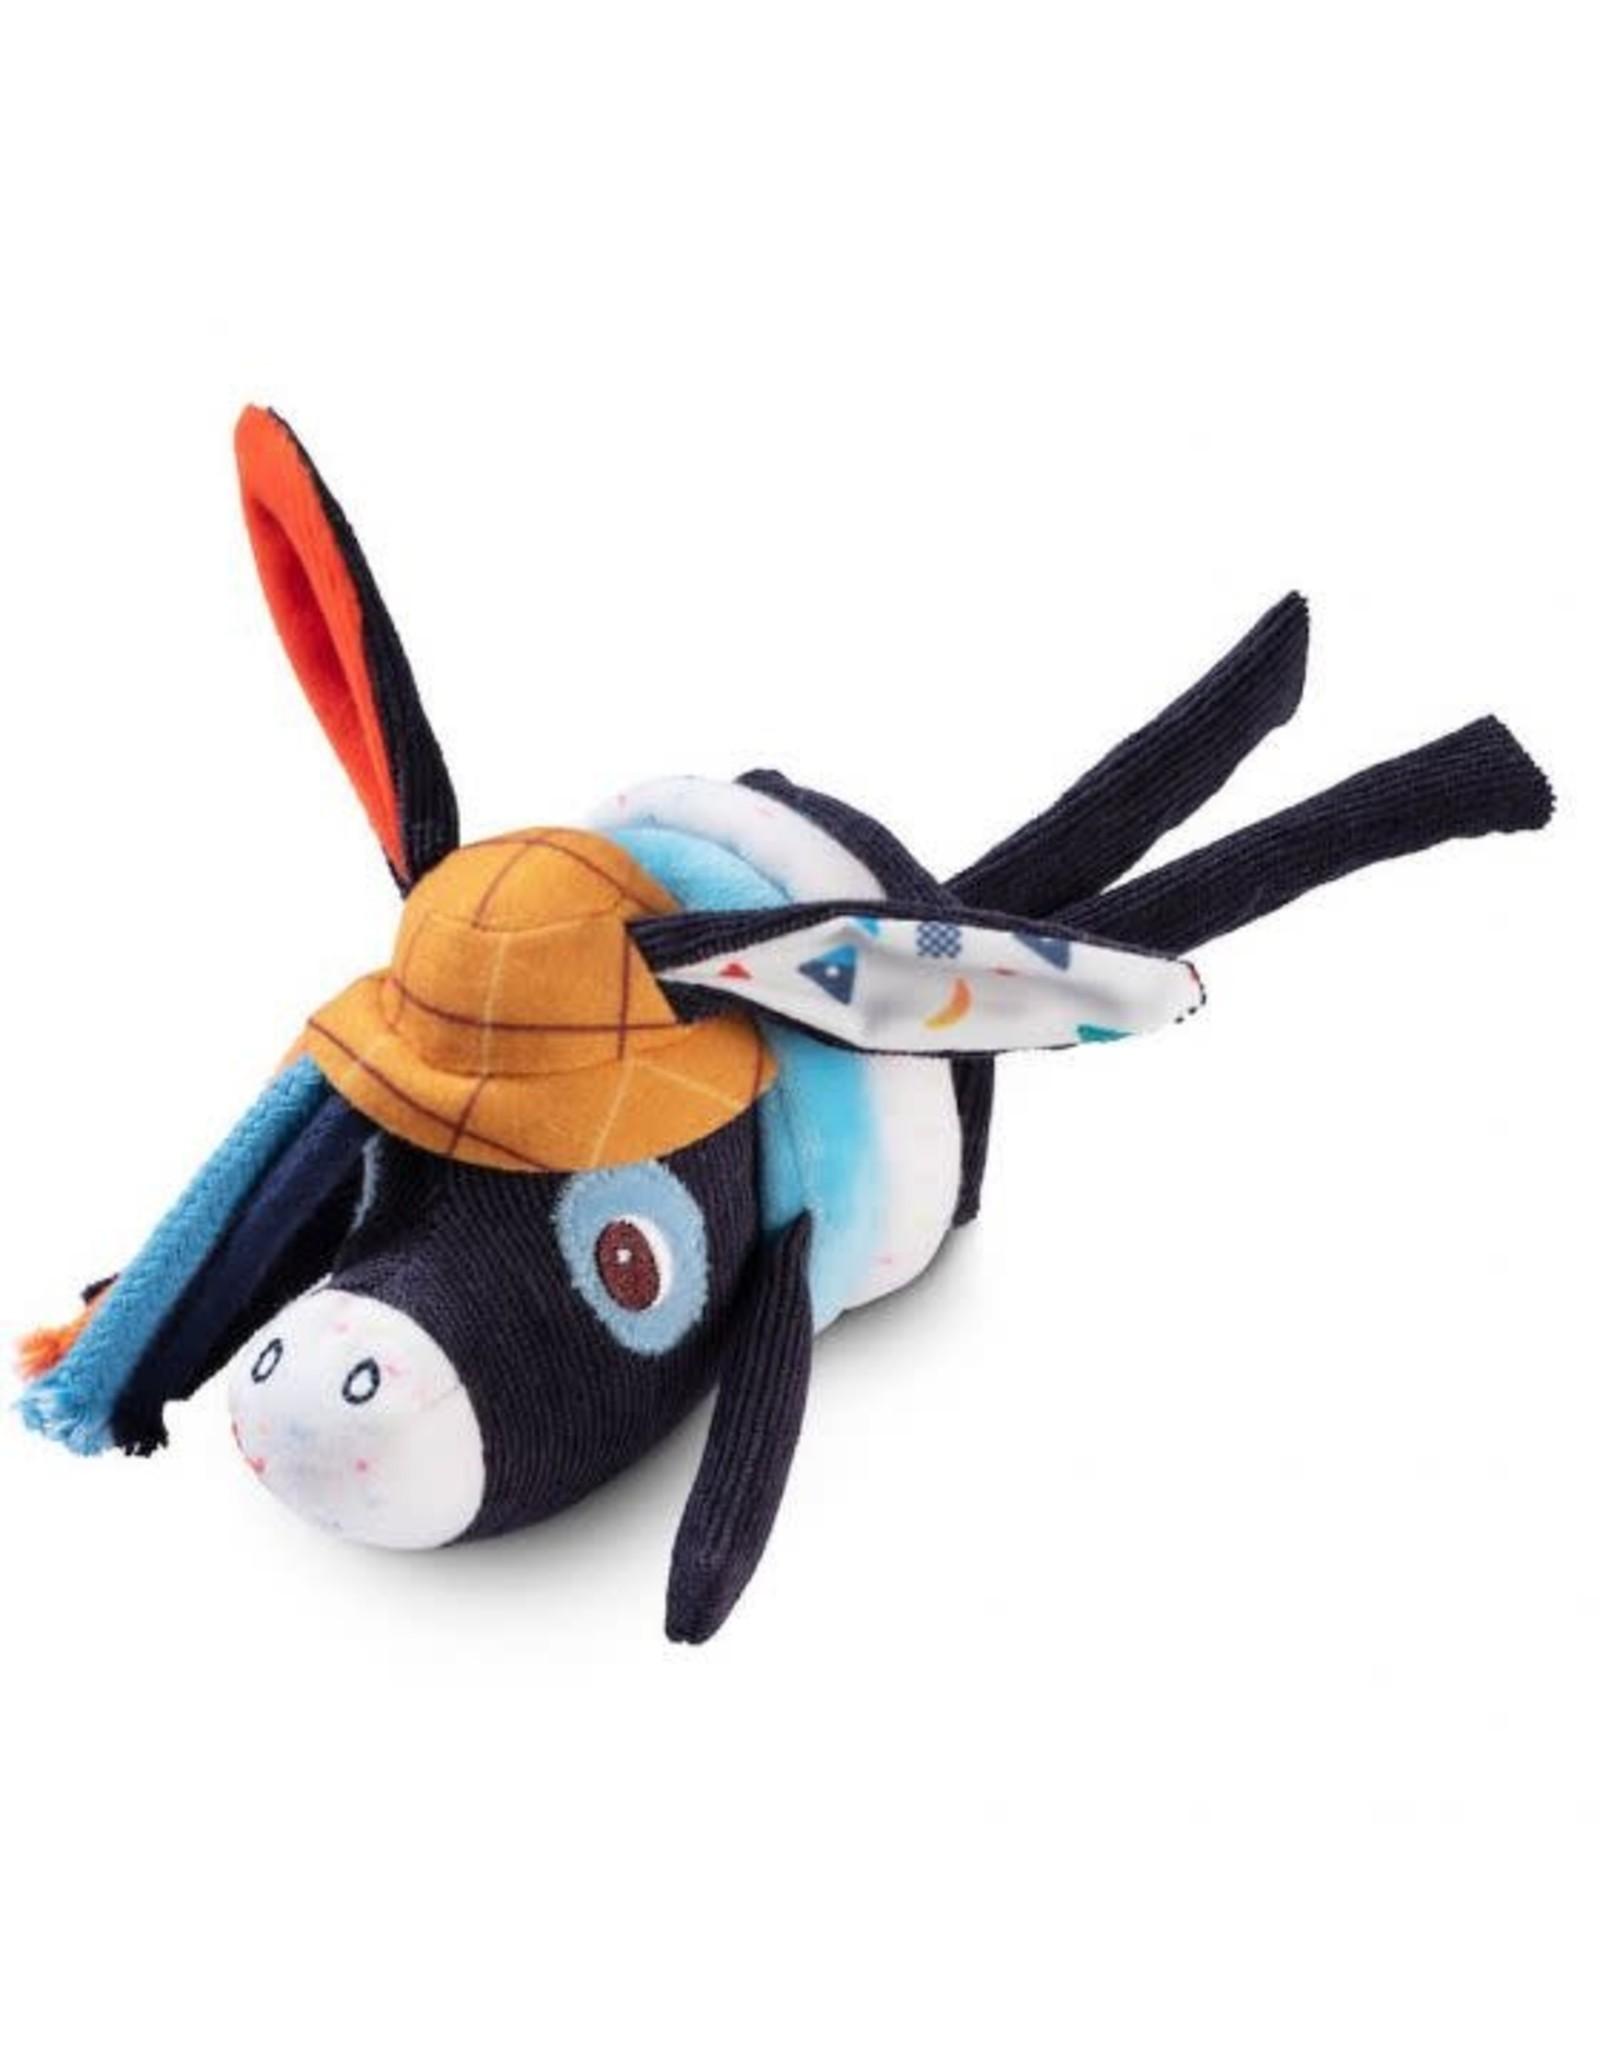 Lilliputiens Mini Dancing Ignace Donkey Activity Toy